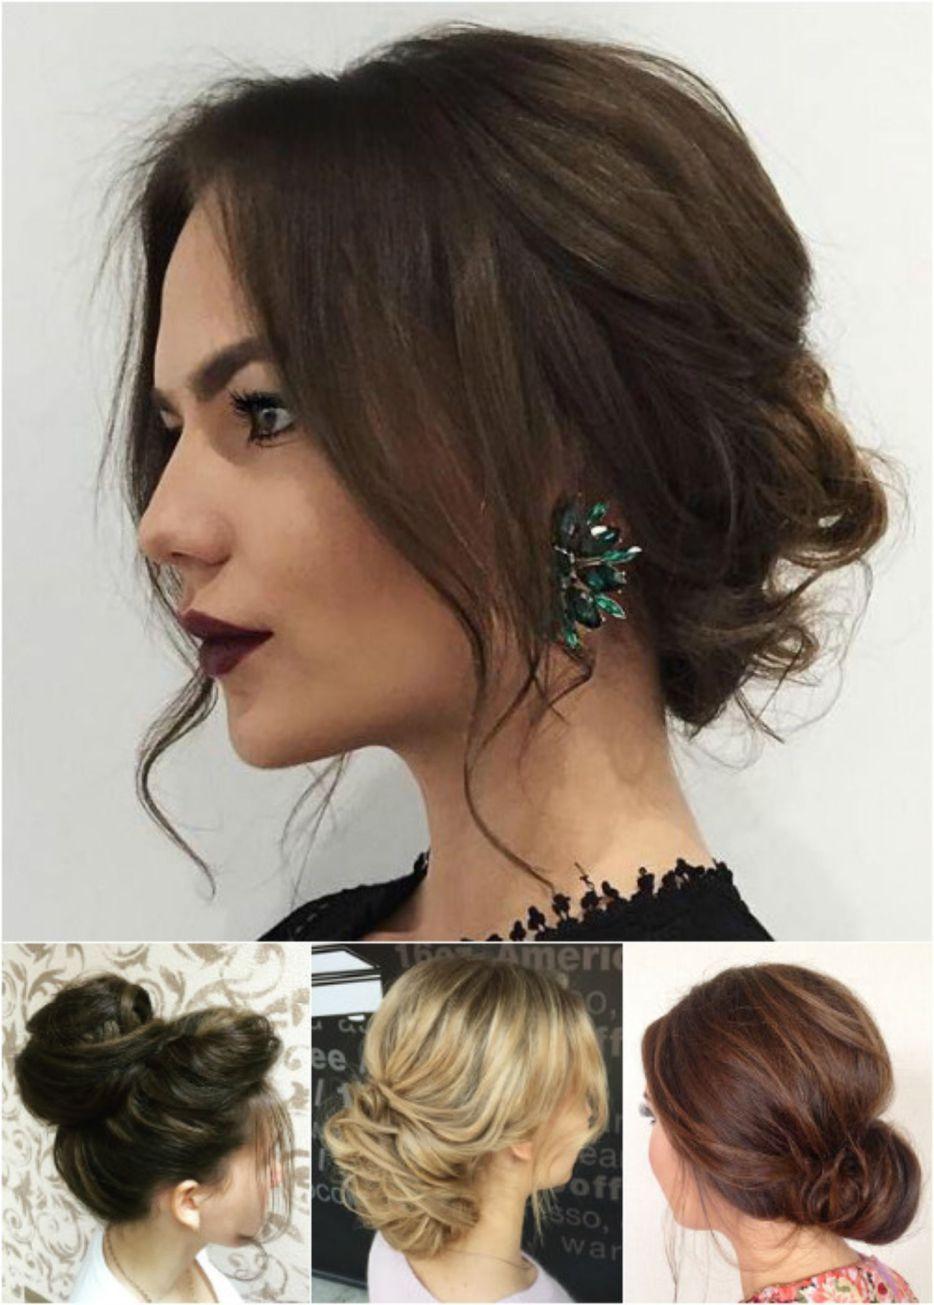 60 Trendiest Updos For Medium Length Hair Hair Lengths Medium Length Hair Styles Updos For Medium Length Hair